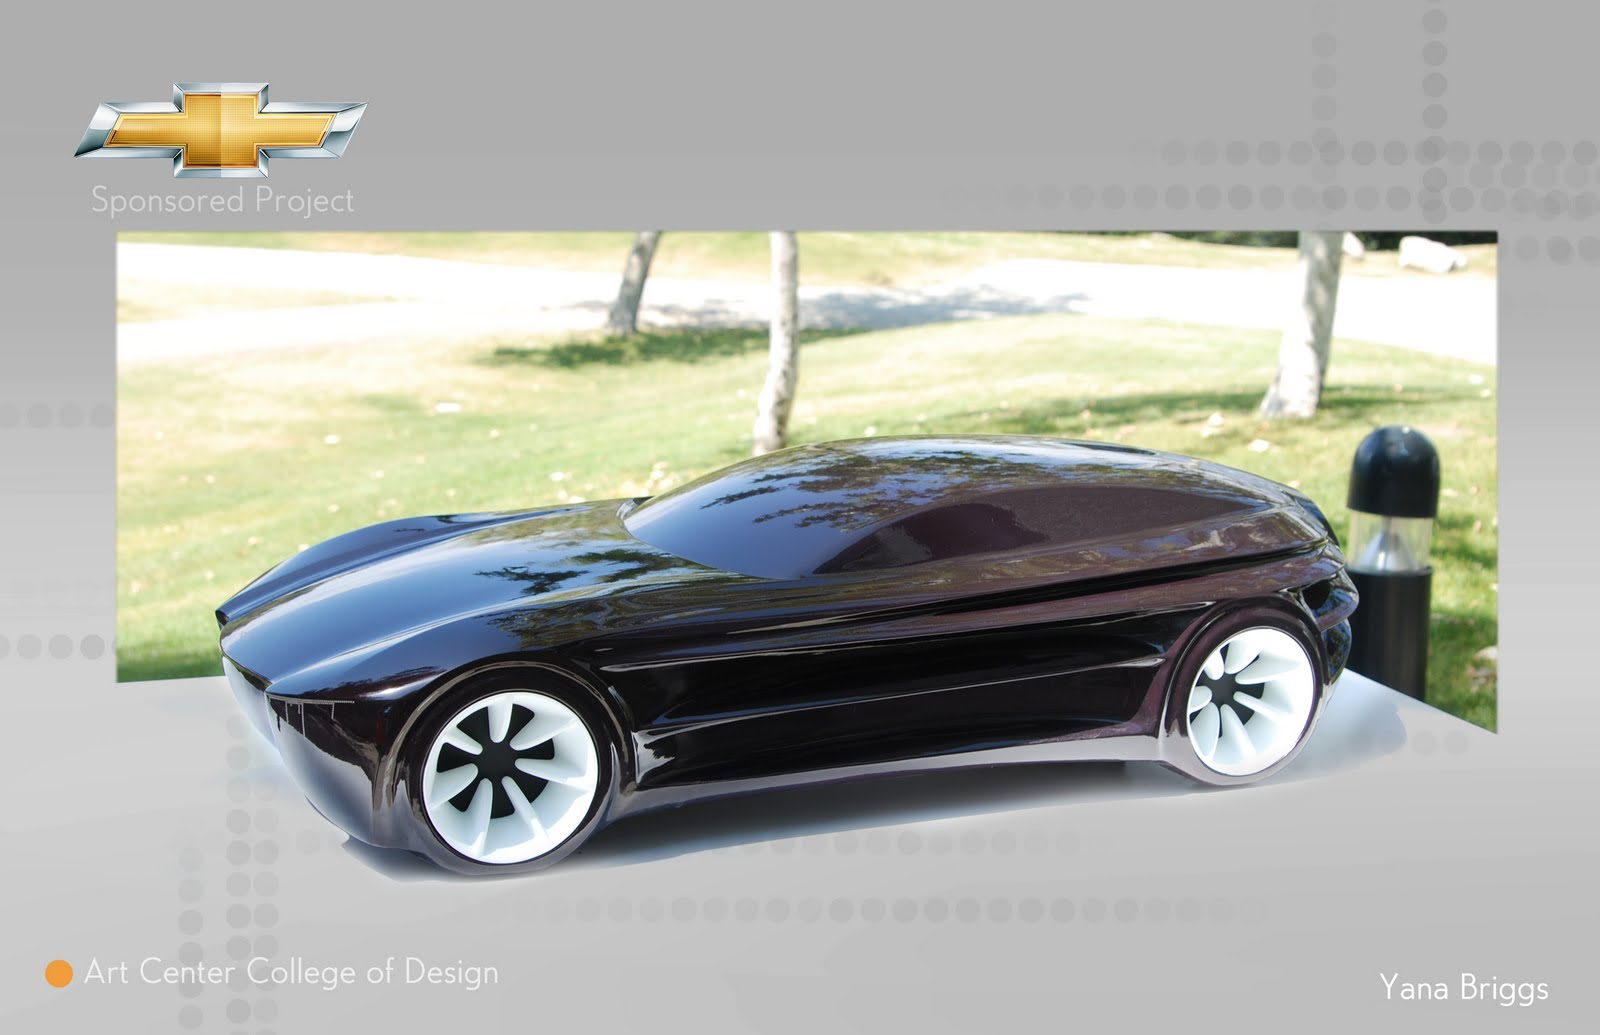 Solar Vehicle inspired design.